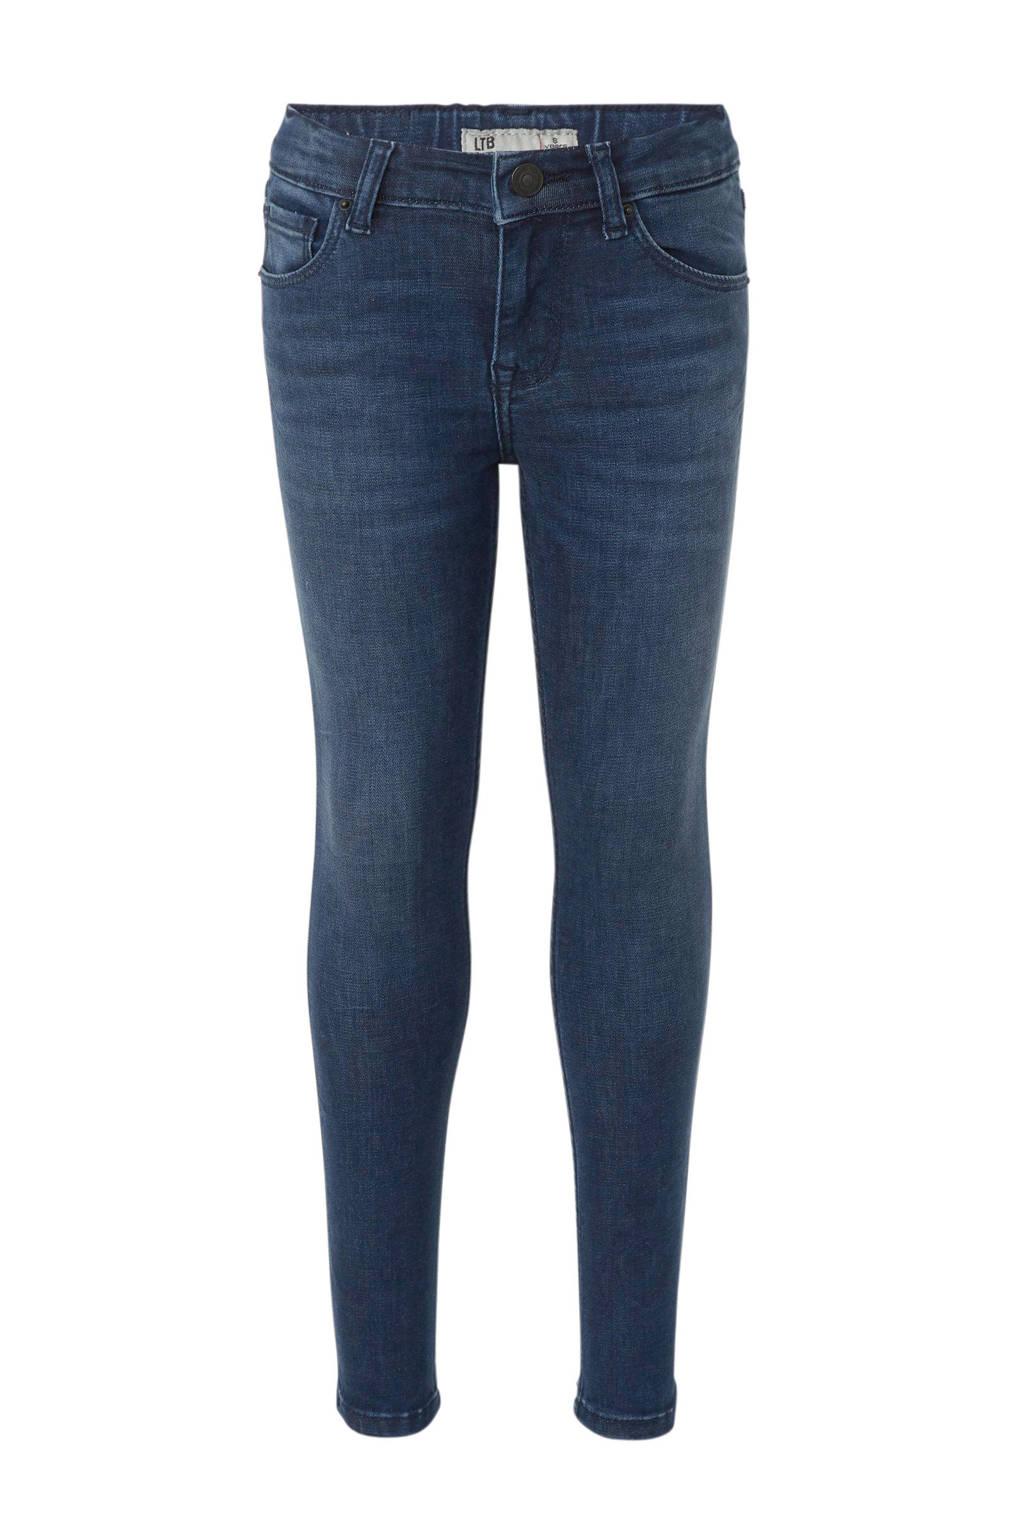 LTB skinny jeans Amy fiona wash, Fiona wash